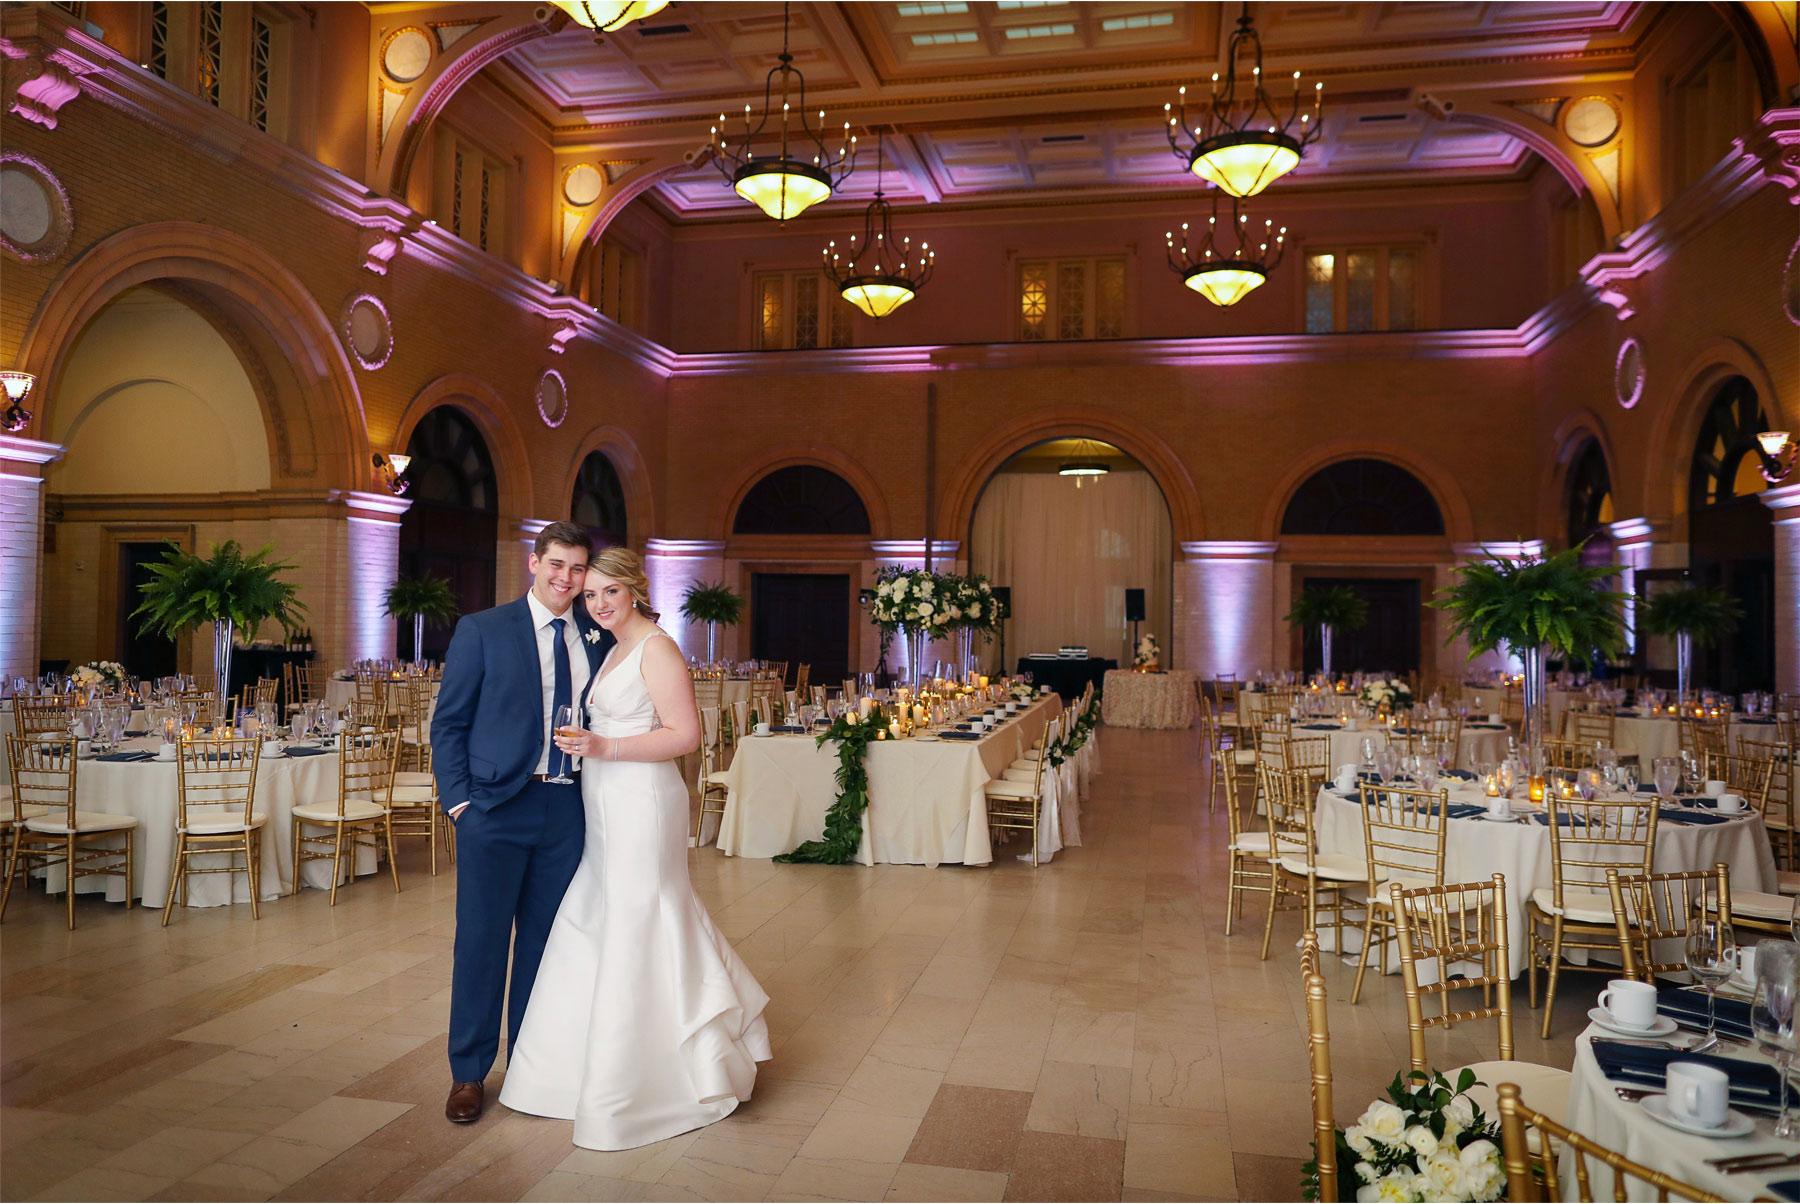 19-Minneapolis-Minnesota-Wedding-Vick-Photography-The-Depot-Reception-Room-Amelia-and-Alexander.jpg